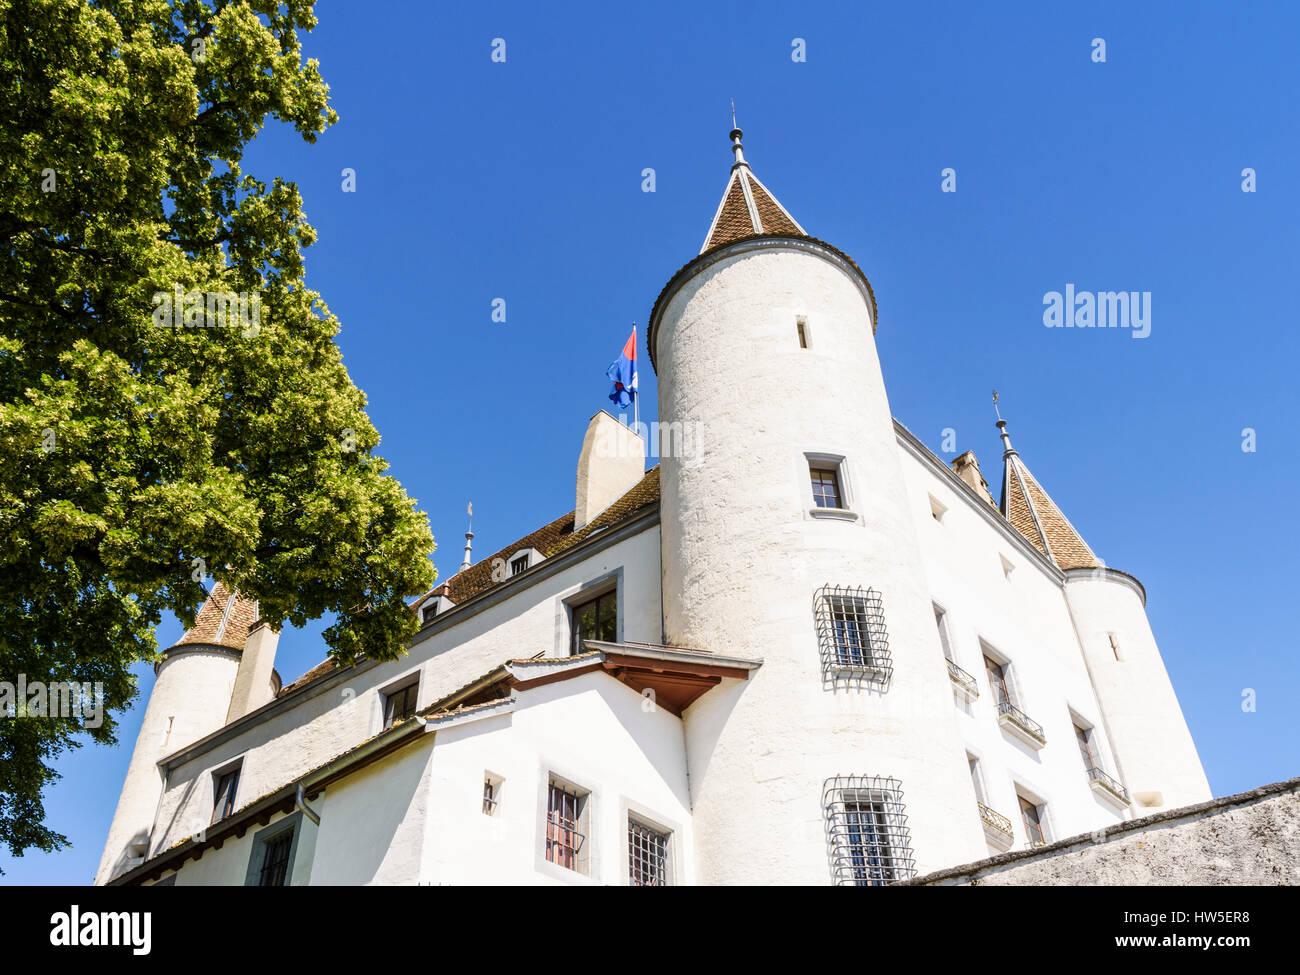 Looking up at the imposing Nyon Castle, Nyon, Switzerland - Stock Image